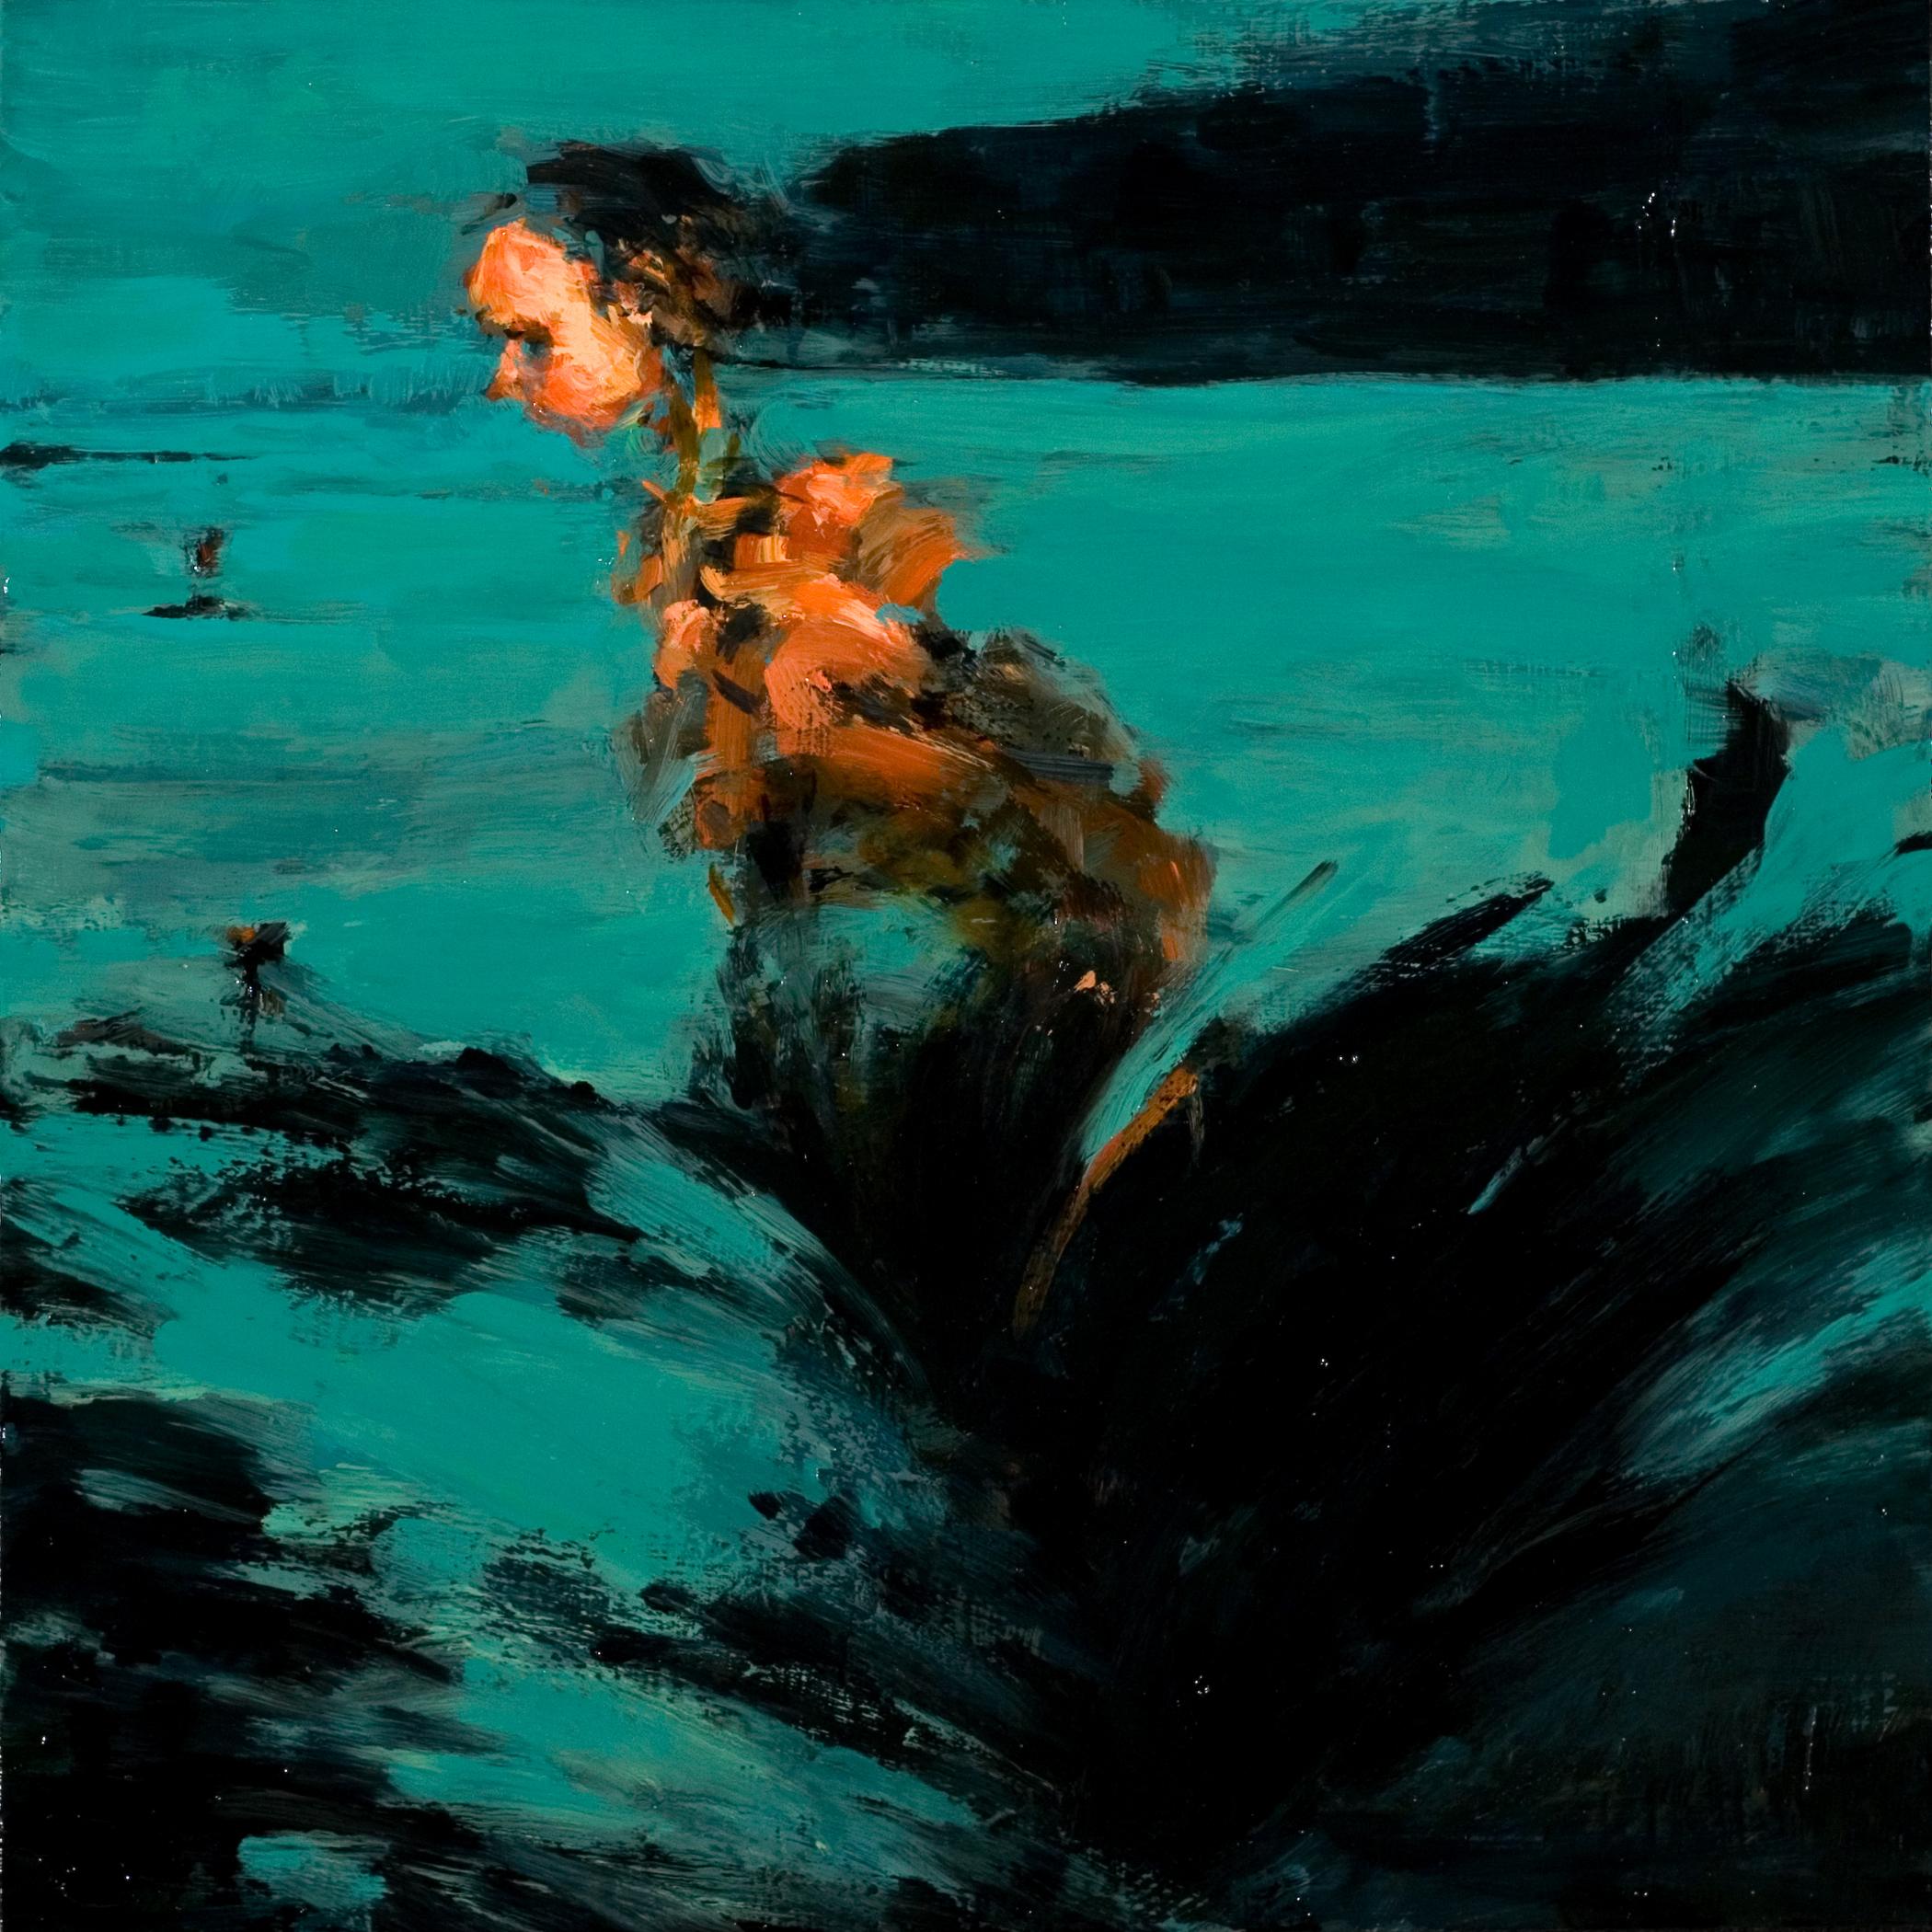 "Shipwreck, oil on board, 12"" x 12"" x 2"", 2012"